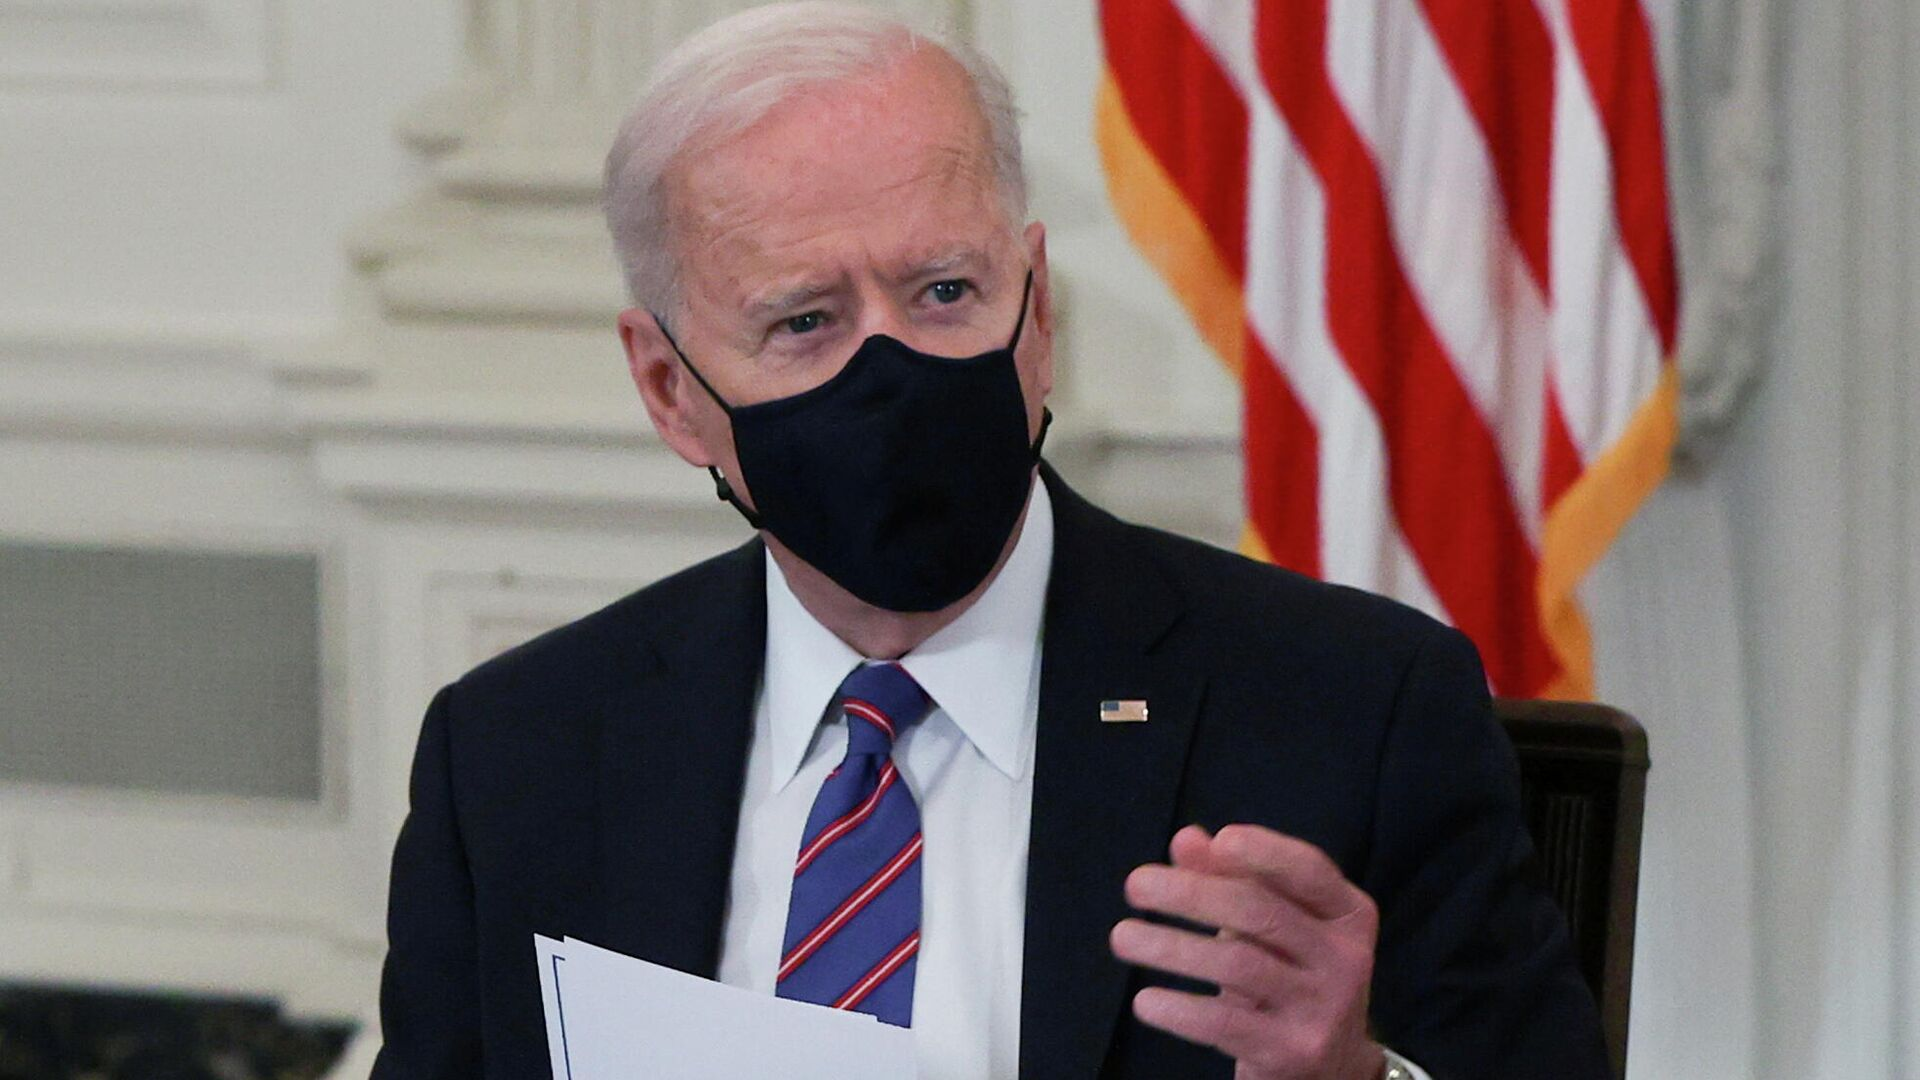 Joe Biden, presidente de EEUU - Sputnik Mundo, 1920, 24.03.2021